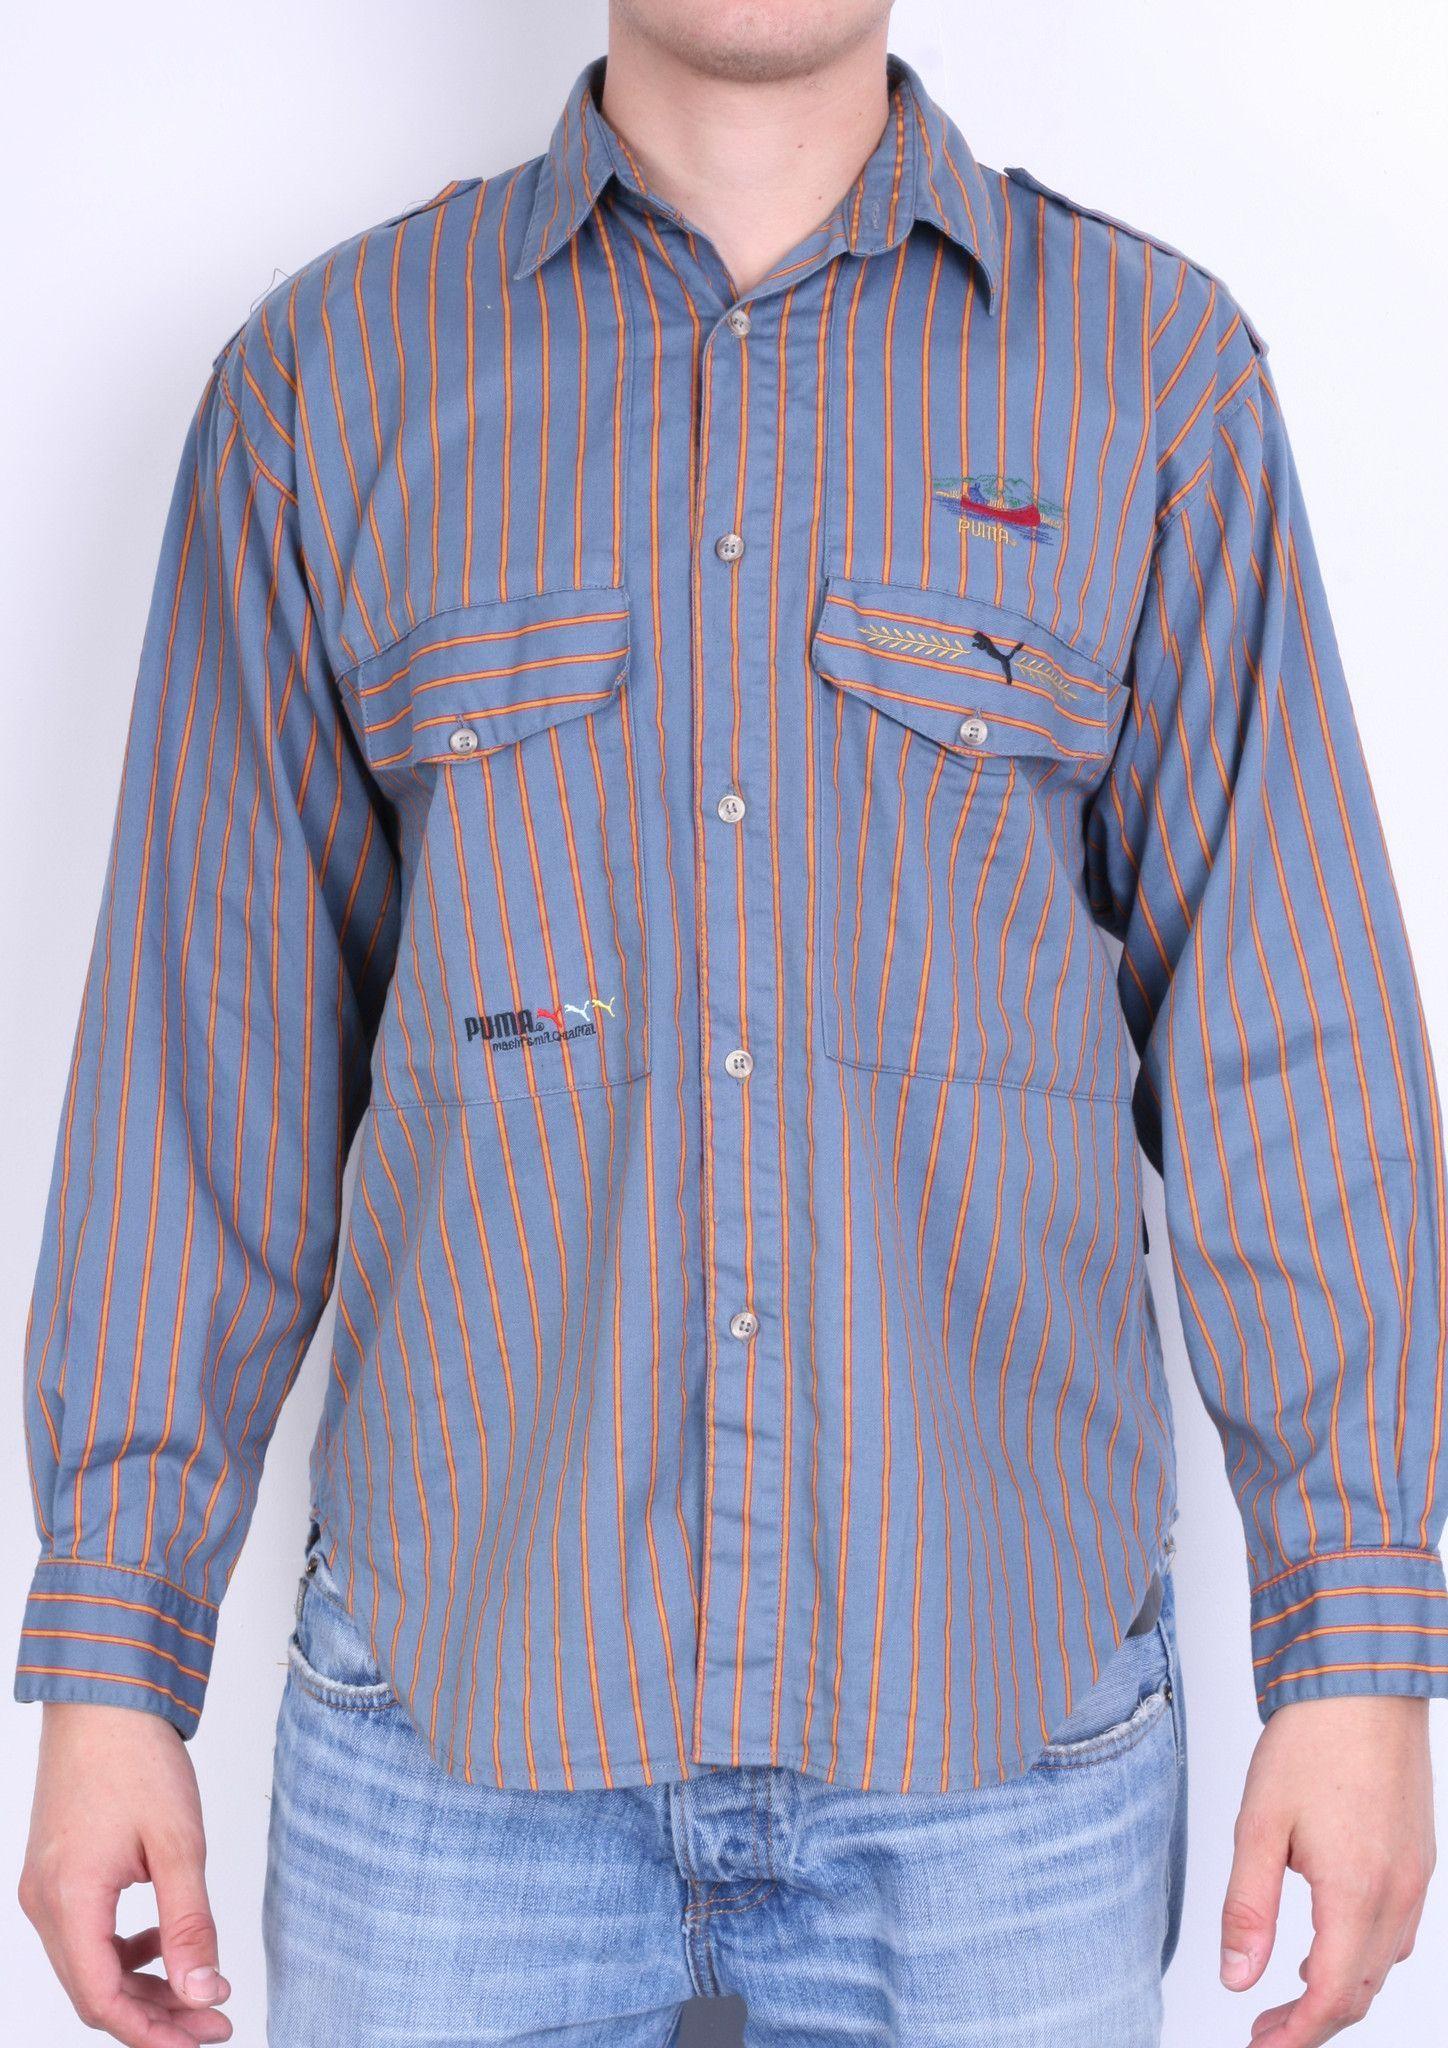 6d5ed58937f8 Puma Mens S Casual Shirt Navy Blue Striped Sport Long Sleeve Cotton ...